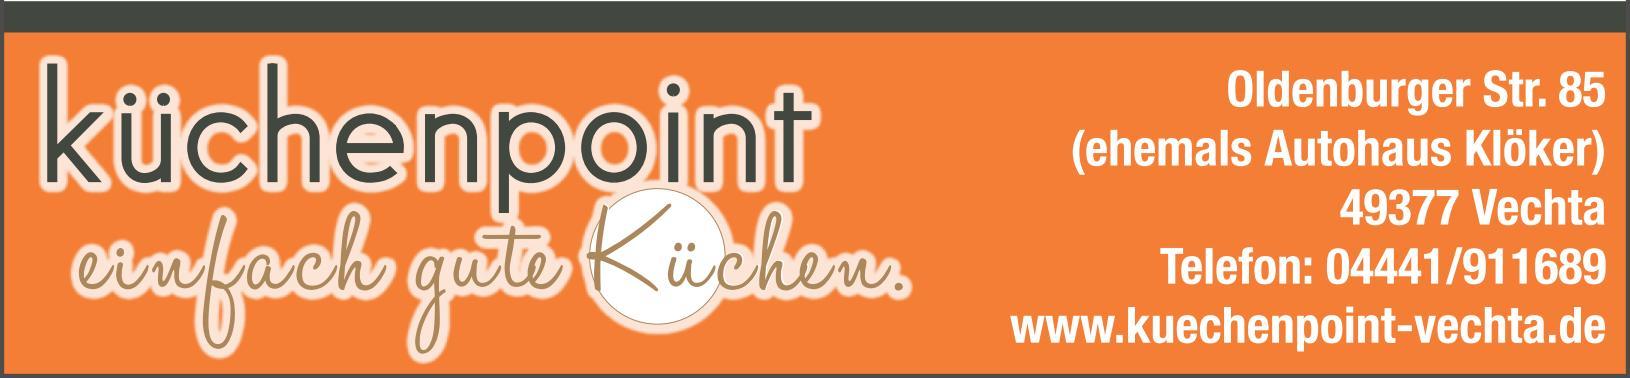 Küchenpoint (1)_01